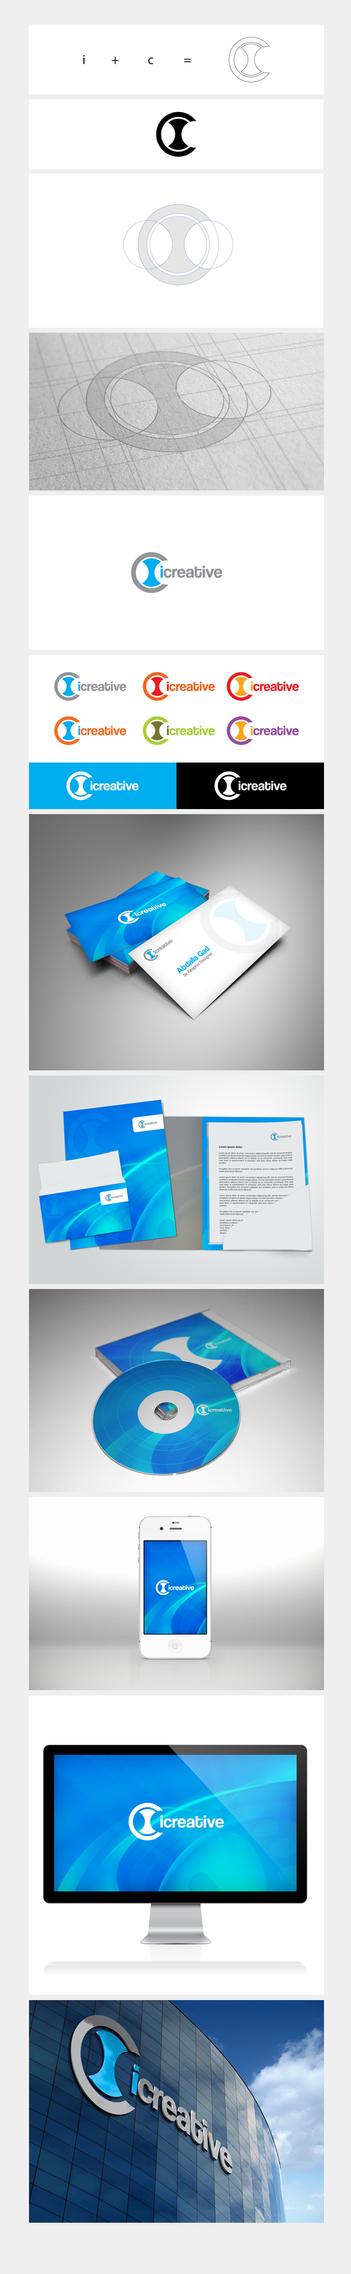 iCreative Branding by GadART